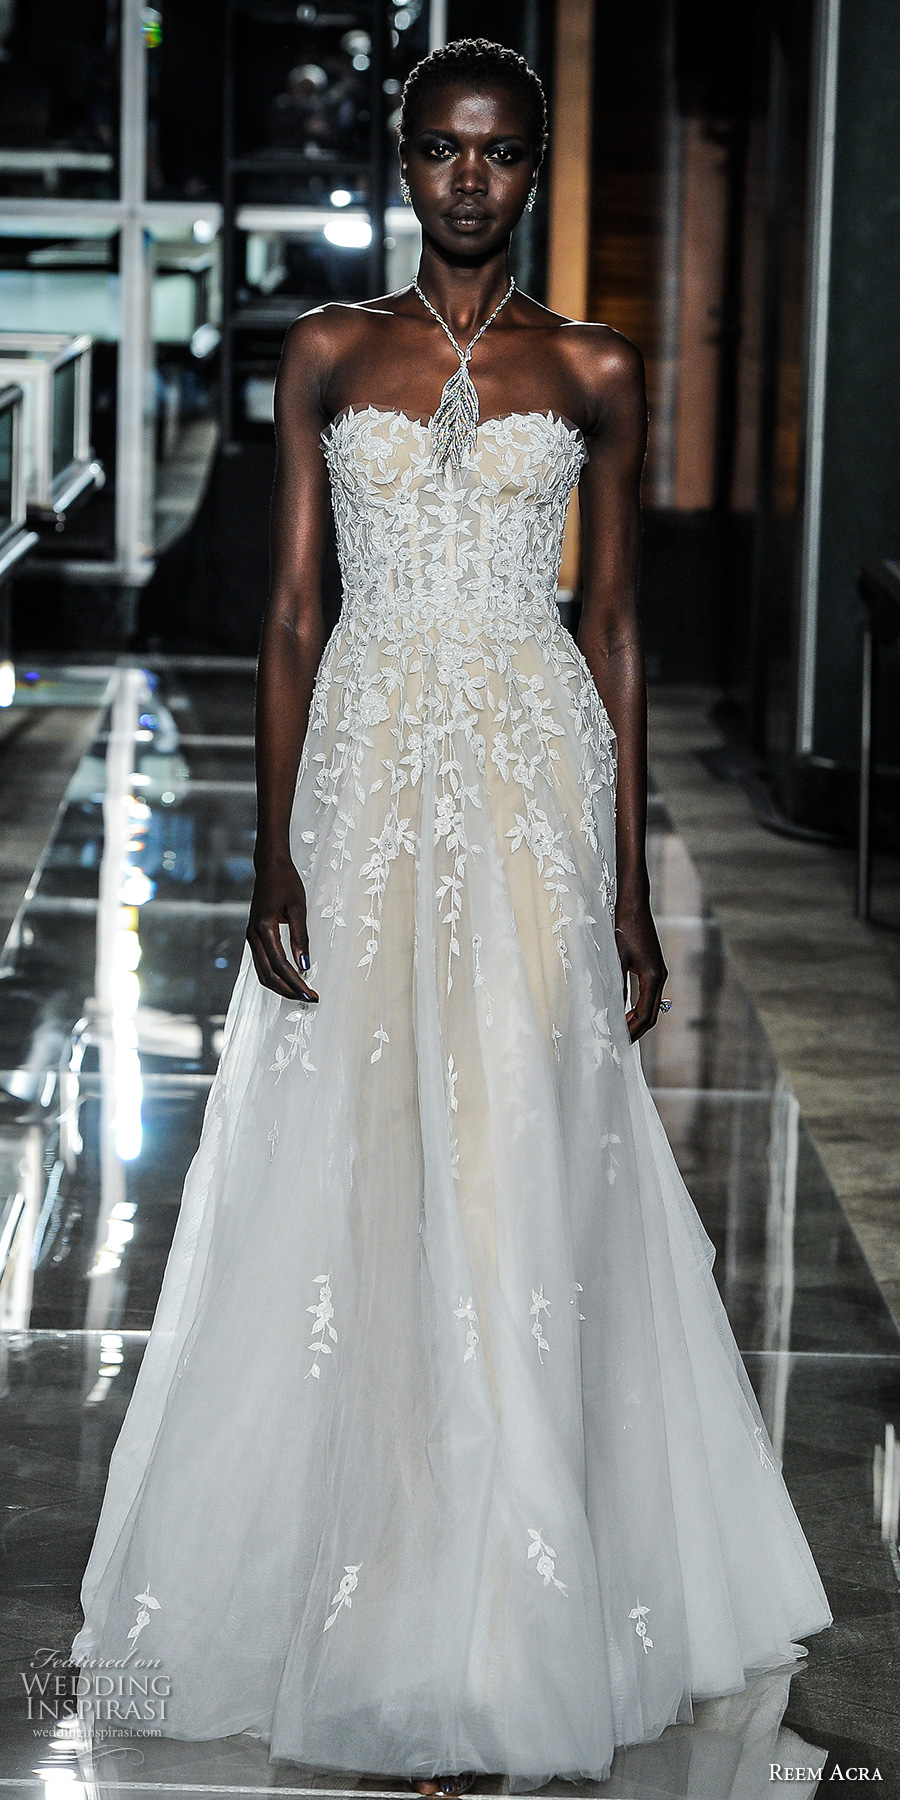 Audrey Hepburn Inspired Wedding Dresses 86 Great reem acra spring bridal